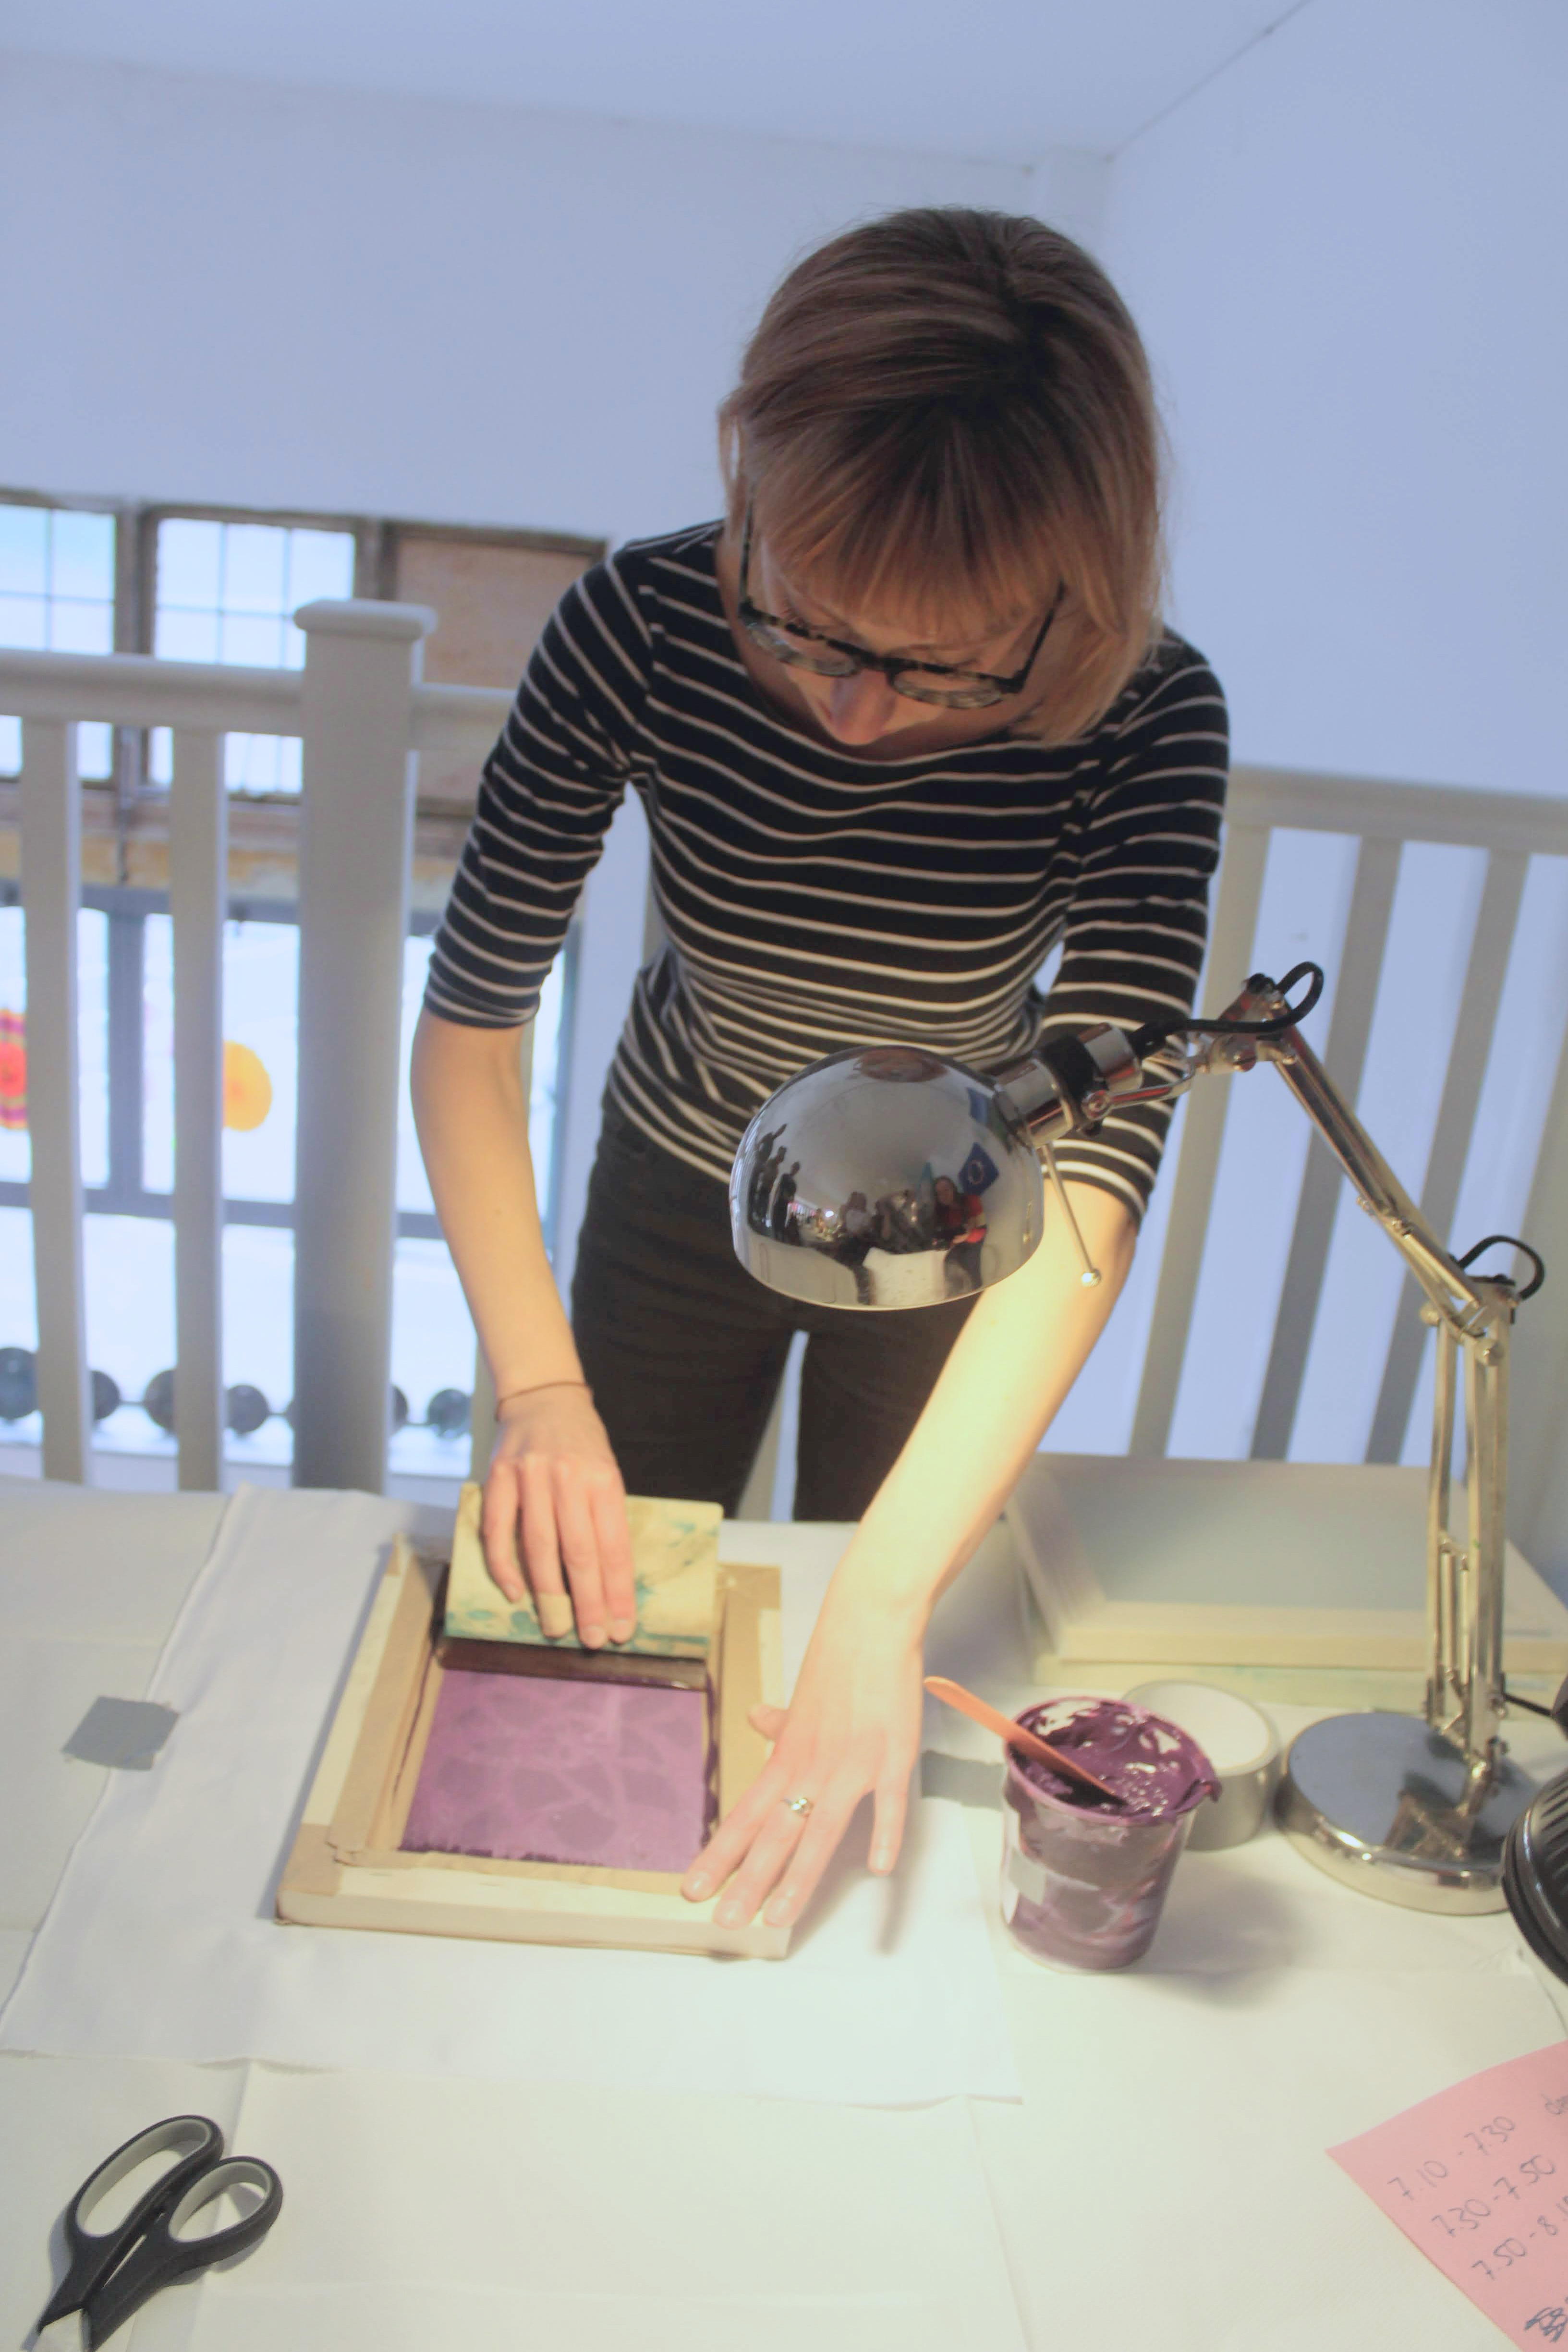 Floral Fabric Printing Workshop by George Prints Design - crafts in London